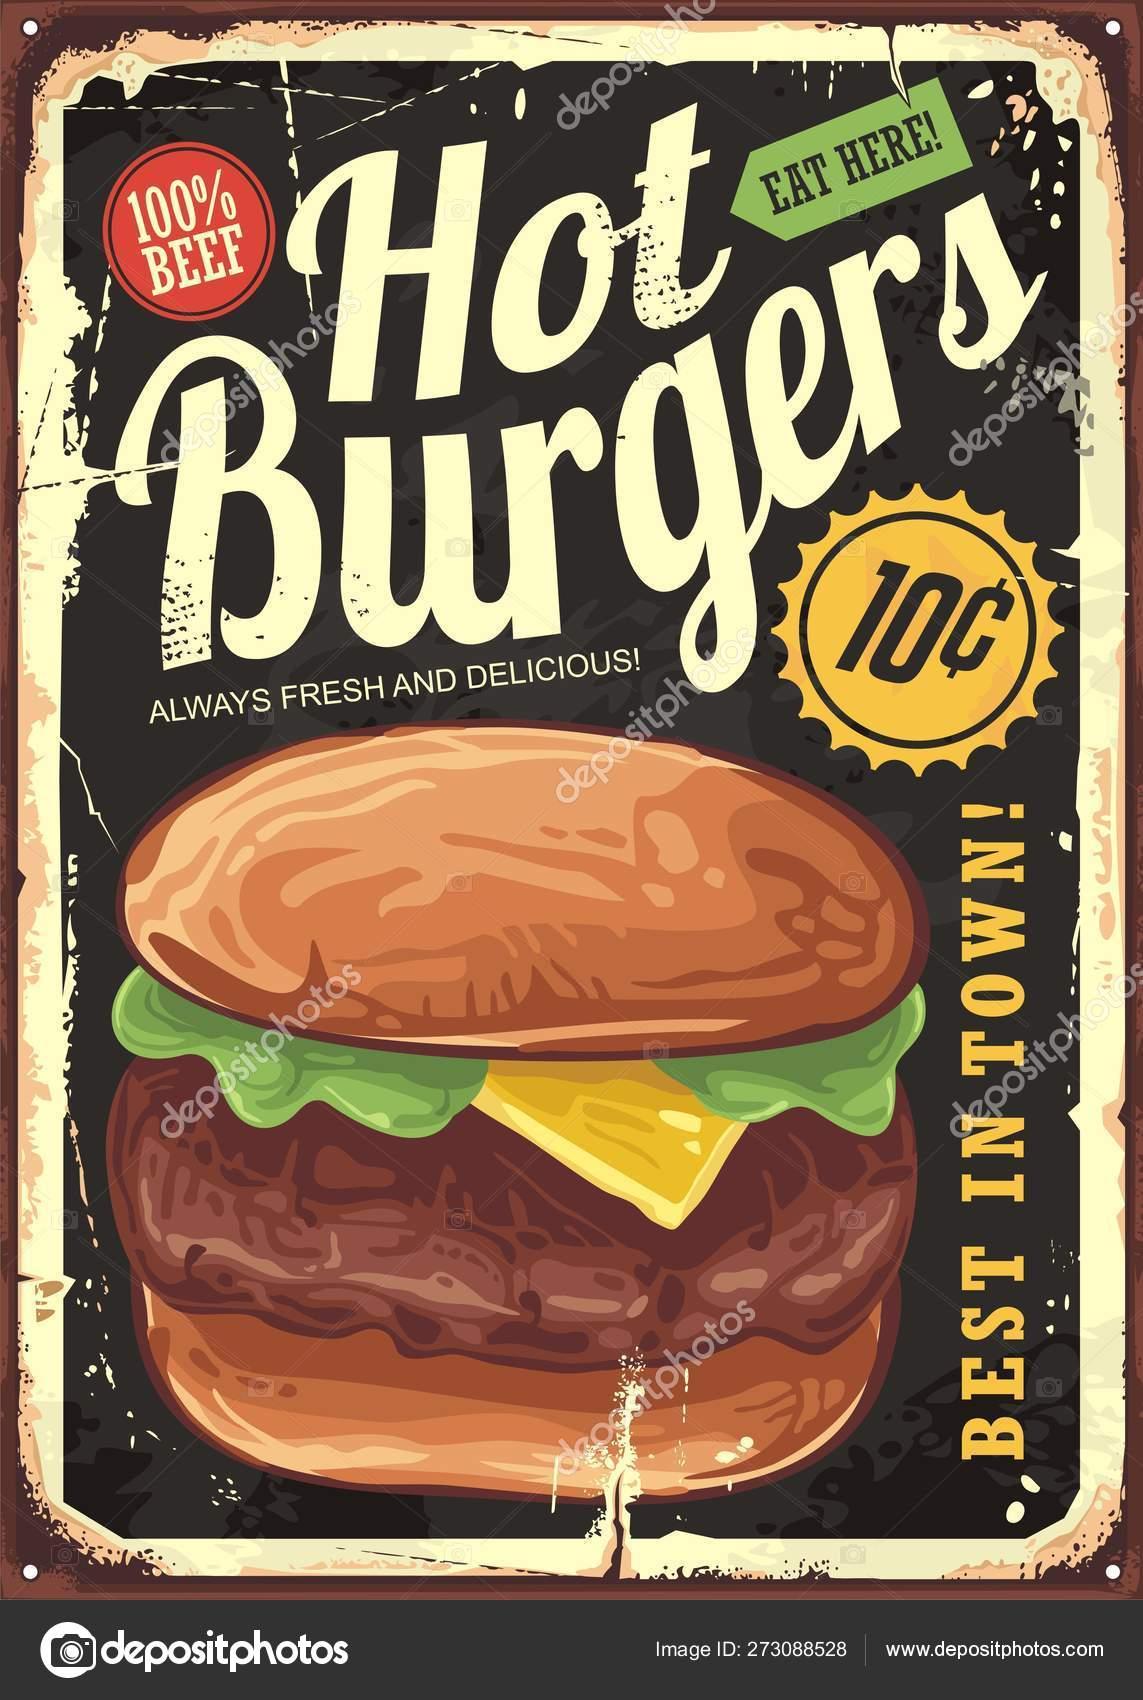 Hot Burgers Vintage Restaurant Sign Retro Poster Design Big Hamburger Stock Vector C Lukeruk 273088528